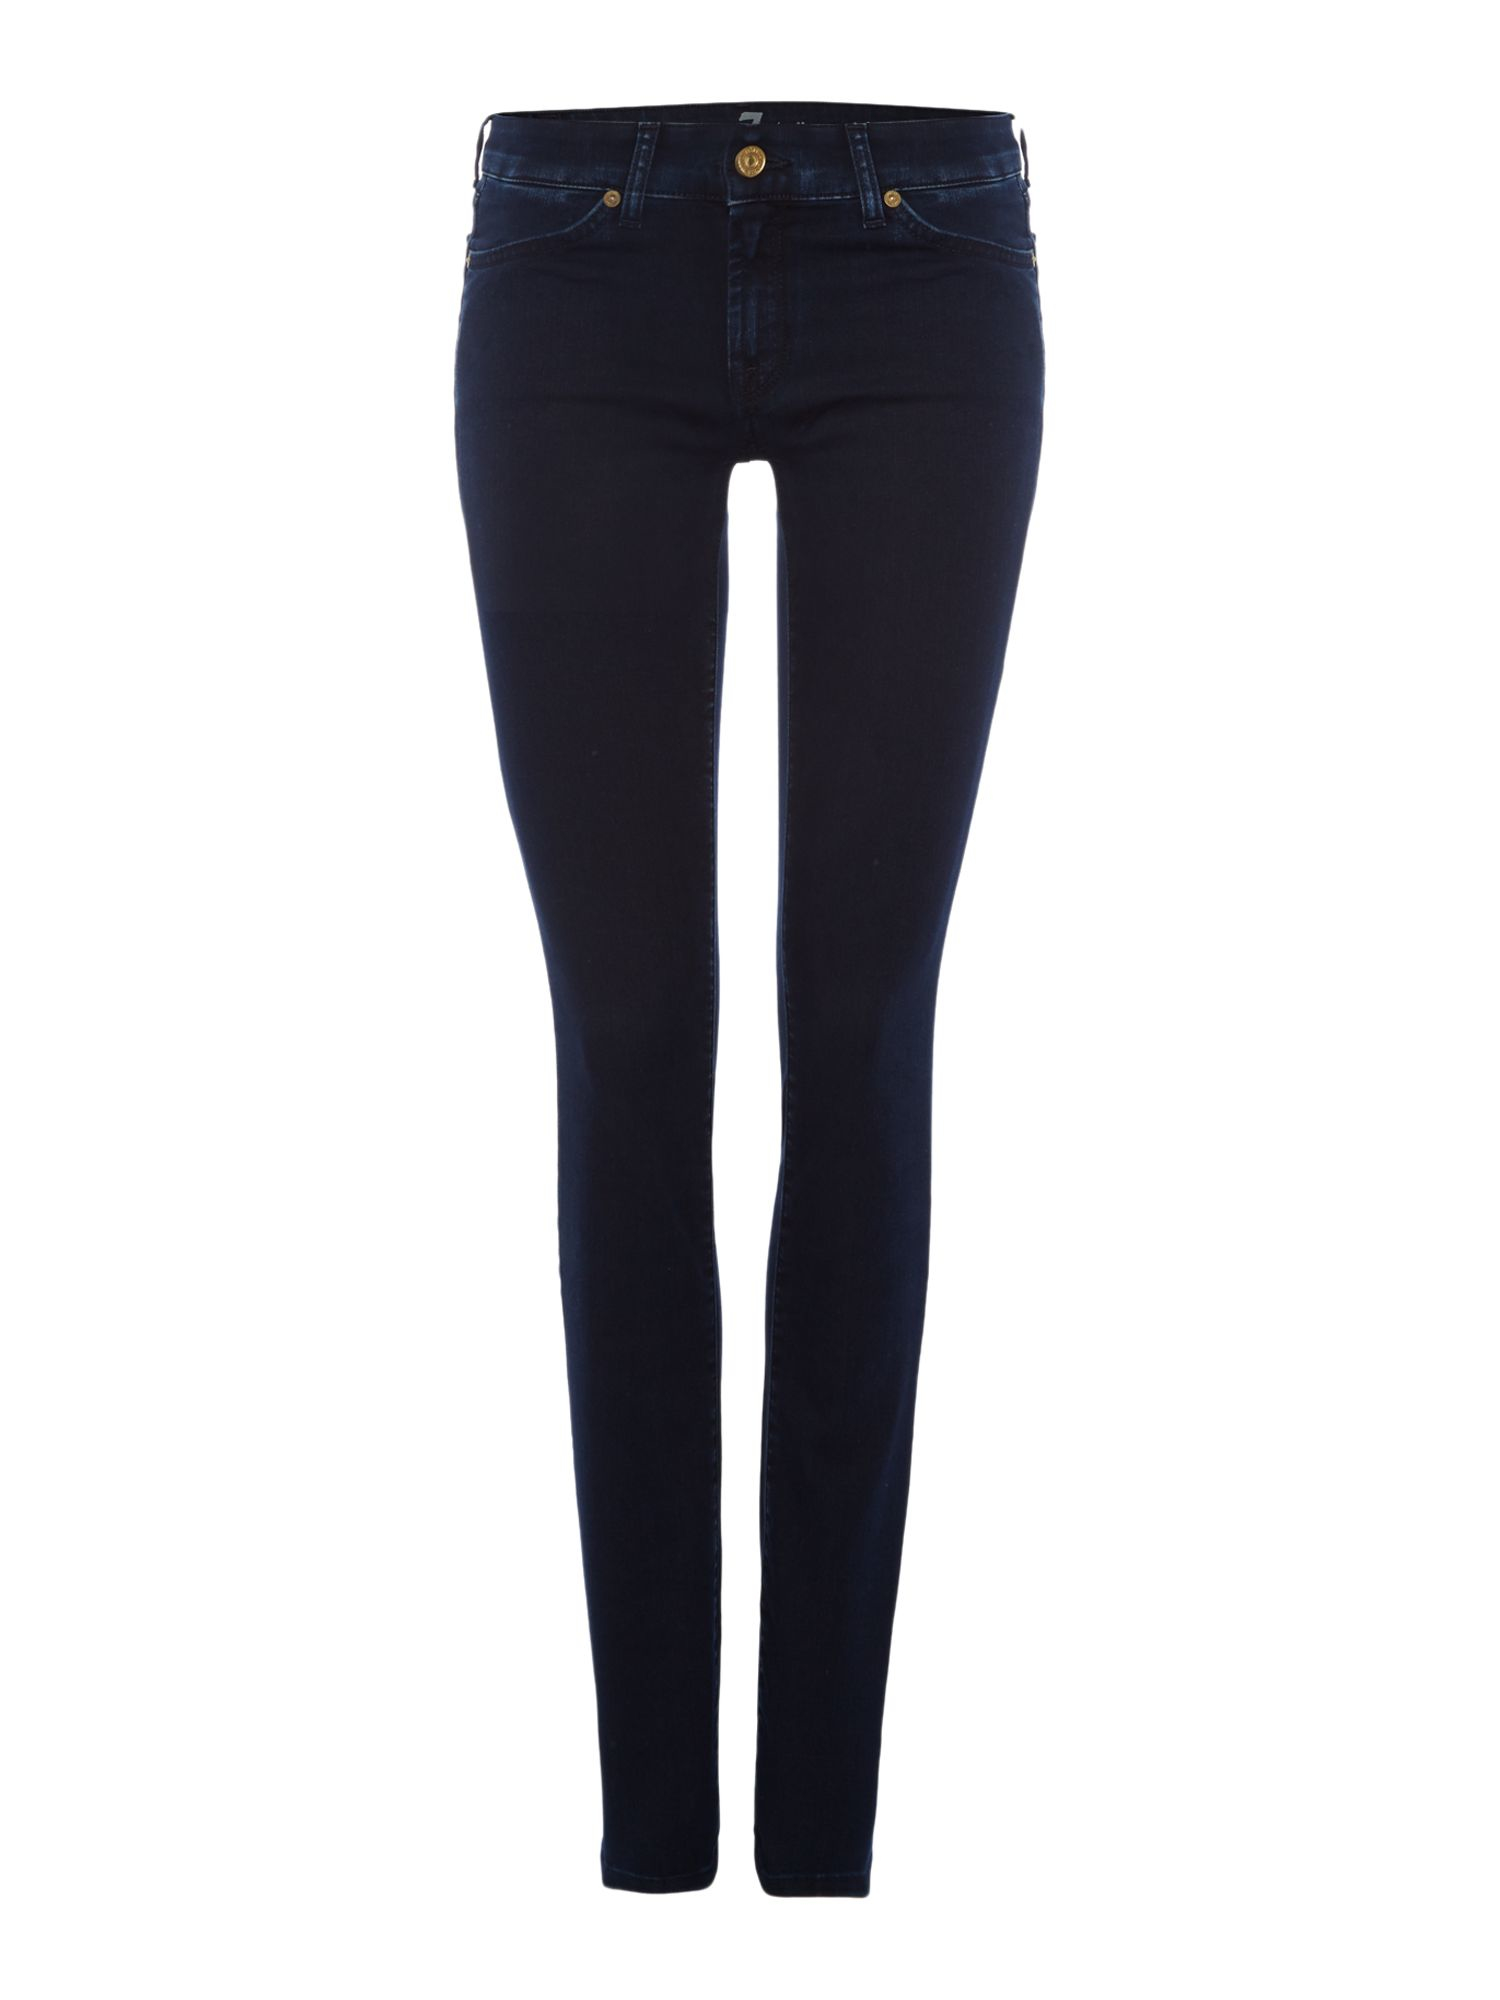 7 for all mankind cristen mid rise skinny jean dark indigo. Black Bedroom Furniture Sets. Home Design Ideas